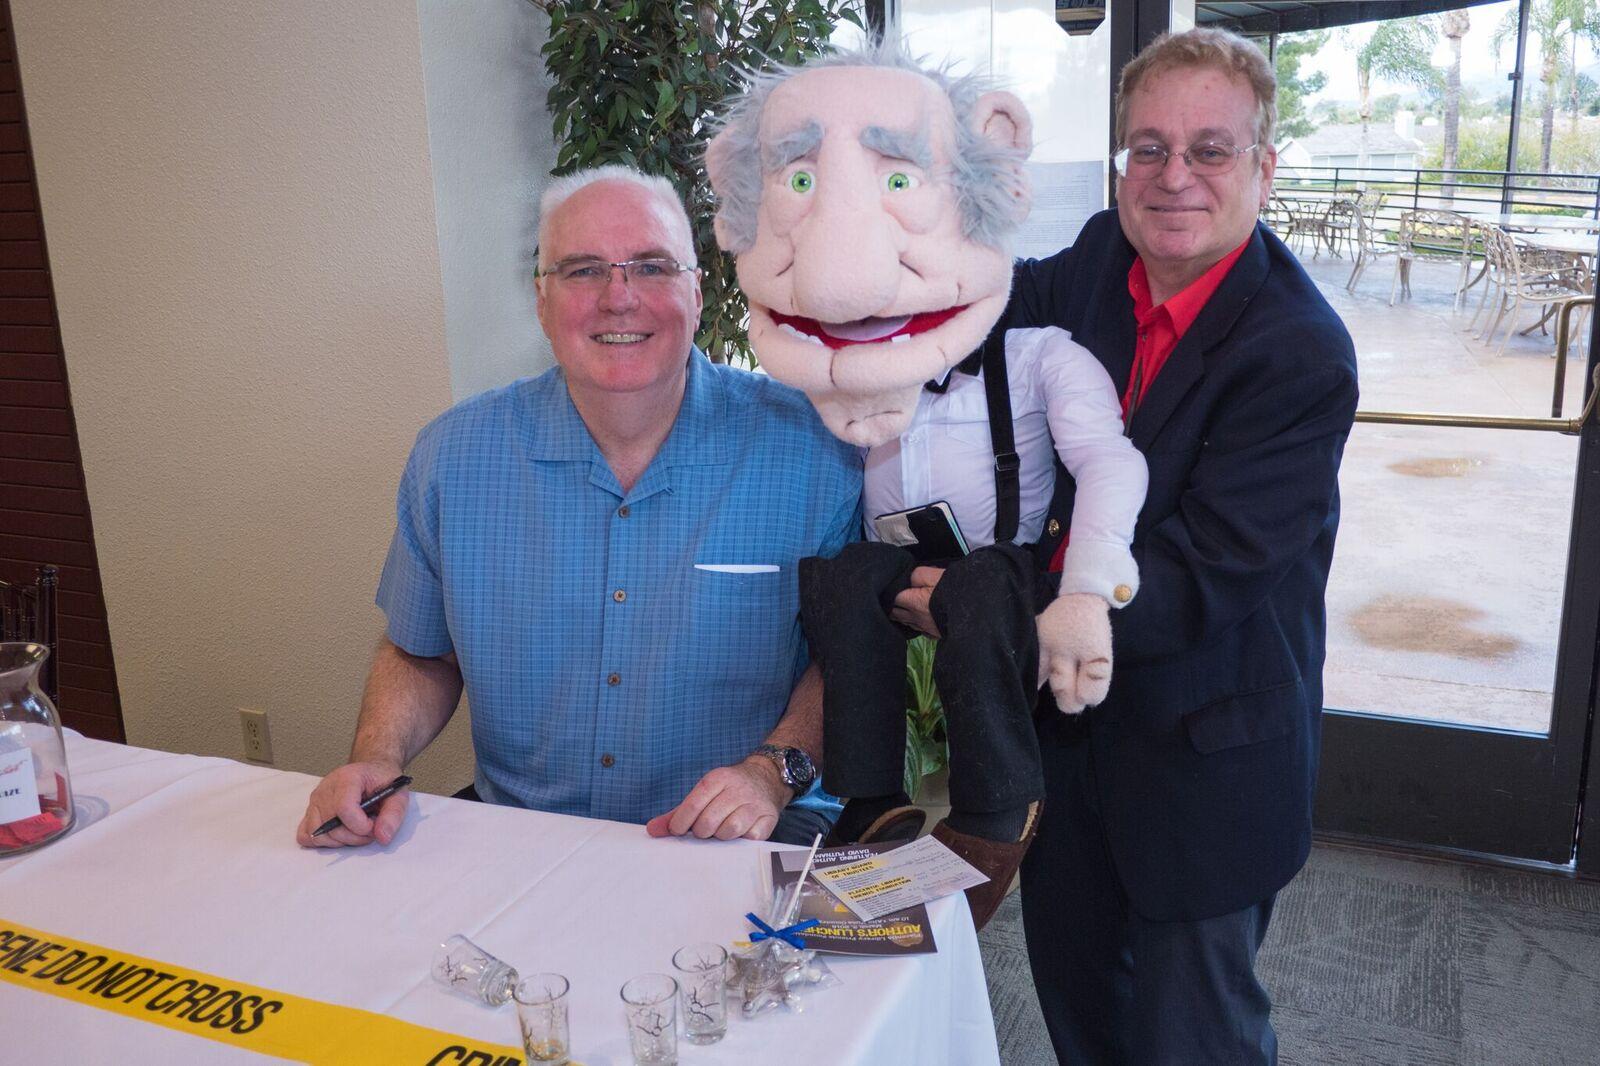 Joe and Arlen Arlington meet David Putnam at the Author's Luncheon